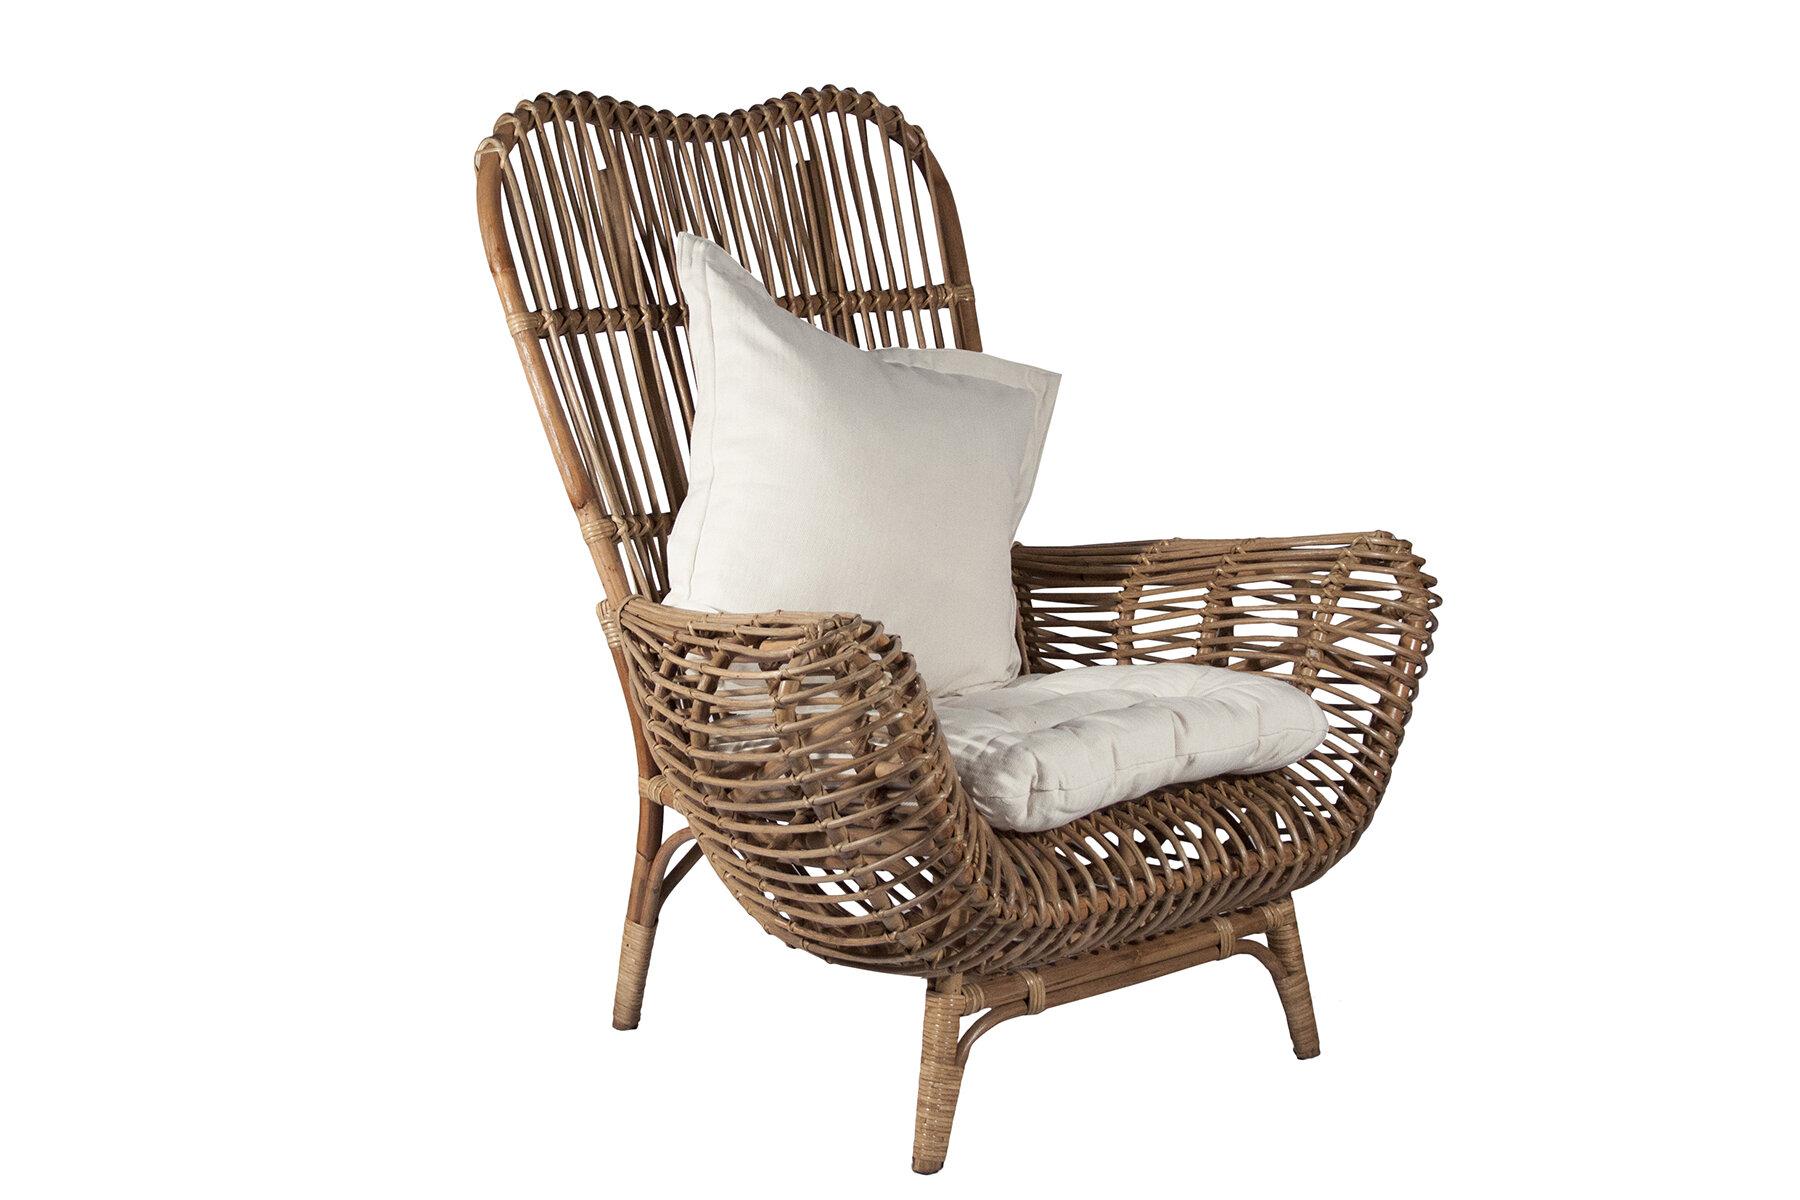 Ibolili Round Back Rattan Chair & Reviews | Wayfair on phoenix sylvestris, nungu fruit, areca catechu, bactris gasipaes,